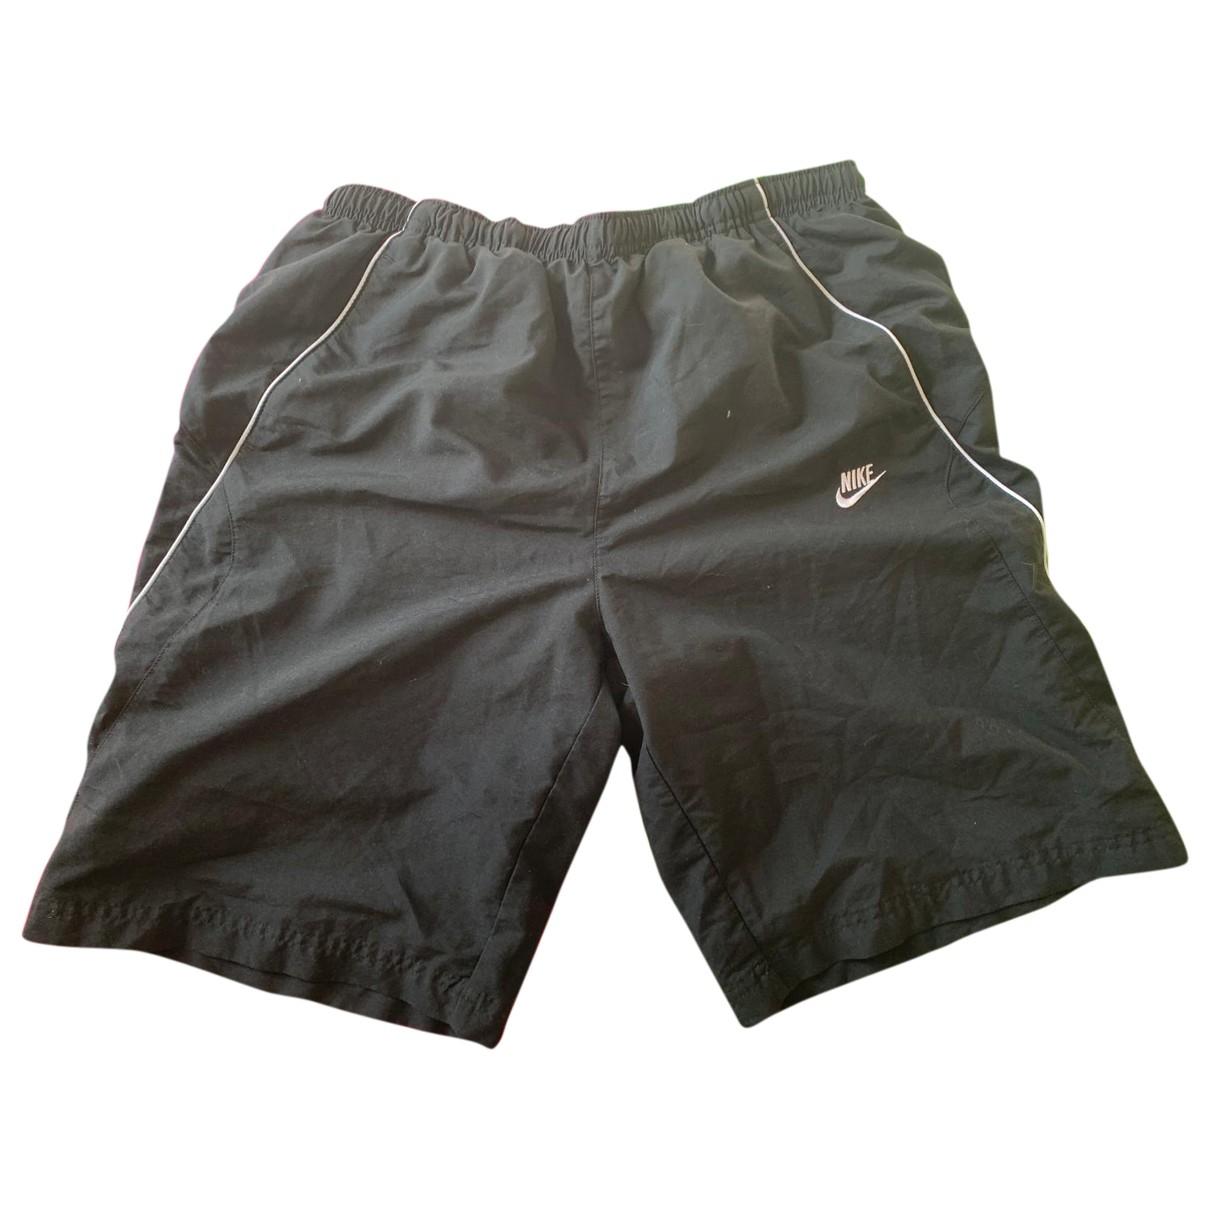 Pantalon corto Nike